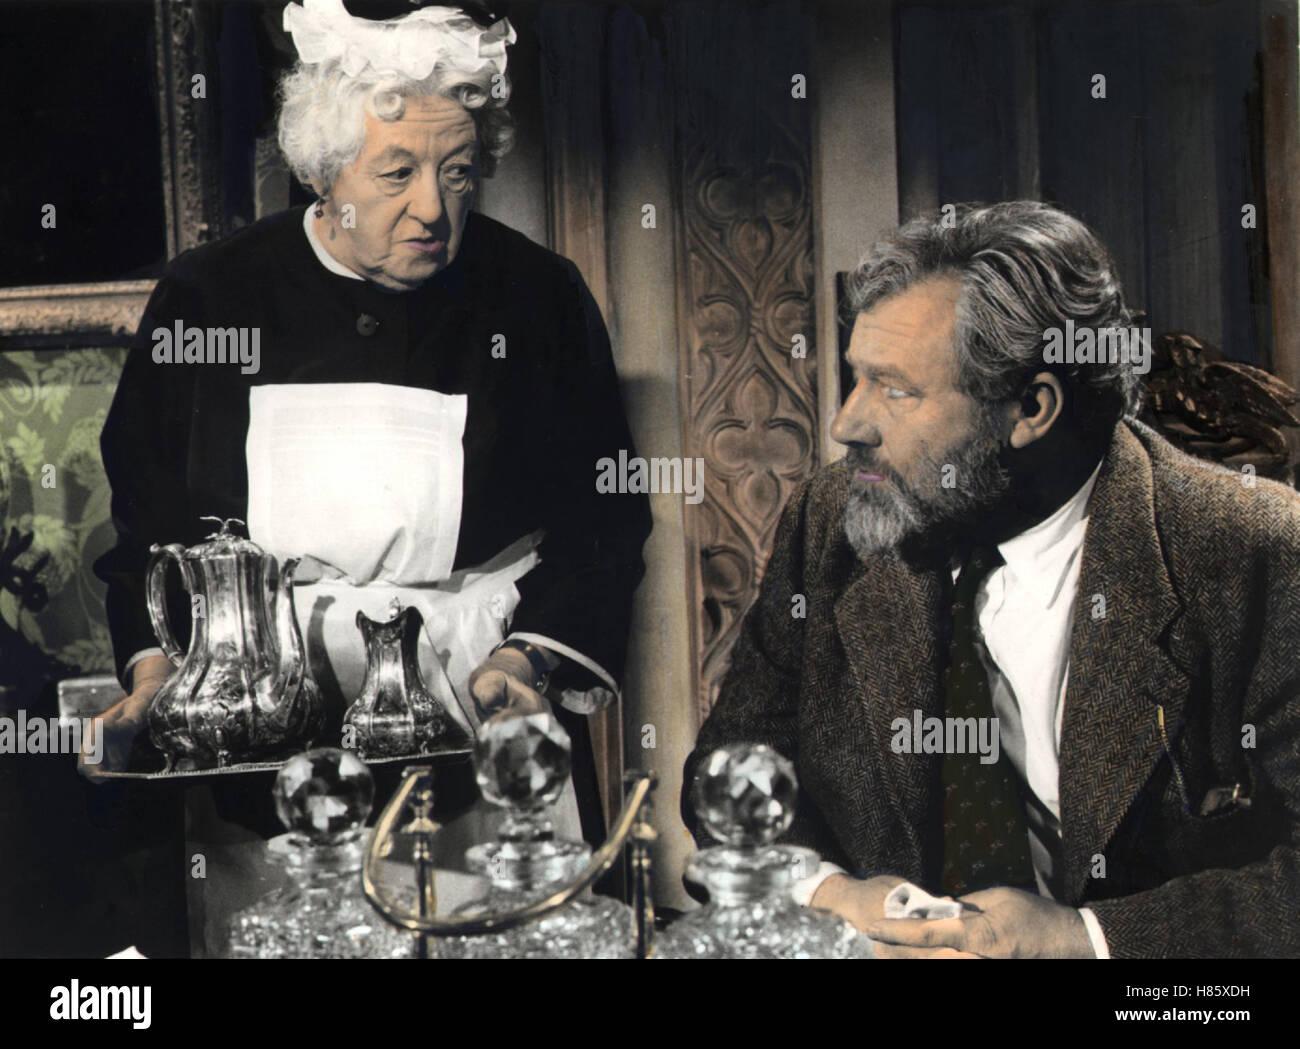 16 Uhr 50 ab Paddington, (MURDER SHE SAID) GB 1961, Regie: George Pollock, MARGARET RUTHERFORD, JAMES ROBERTSON - Stock Image